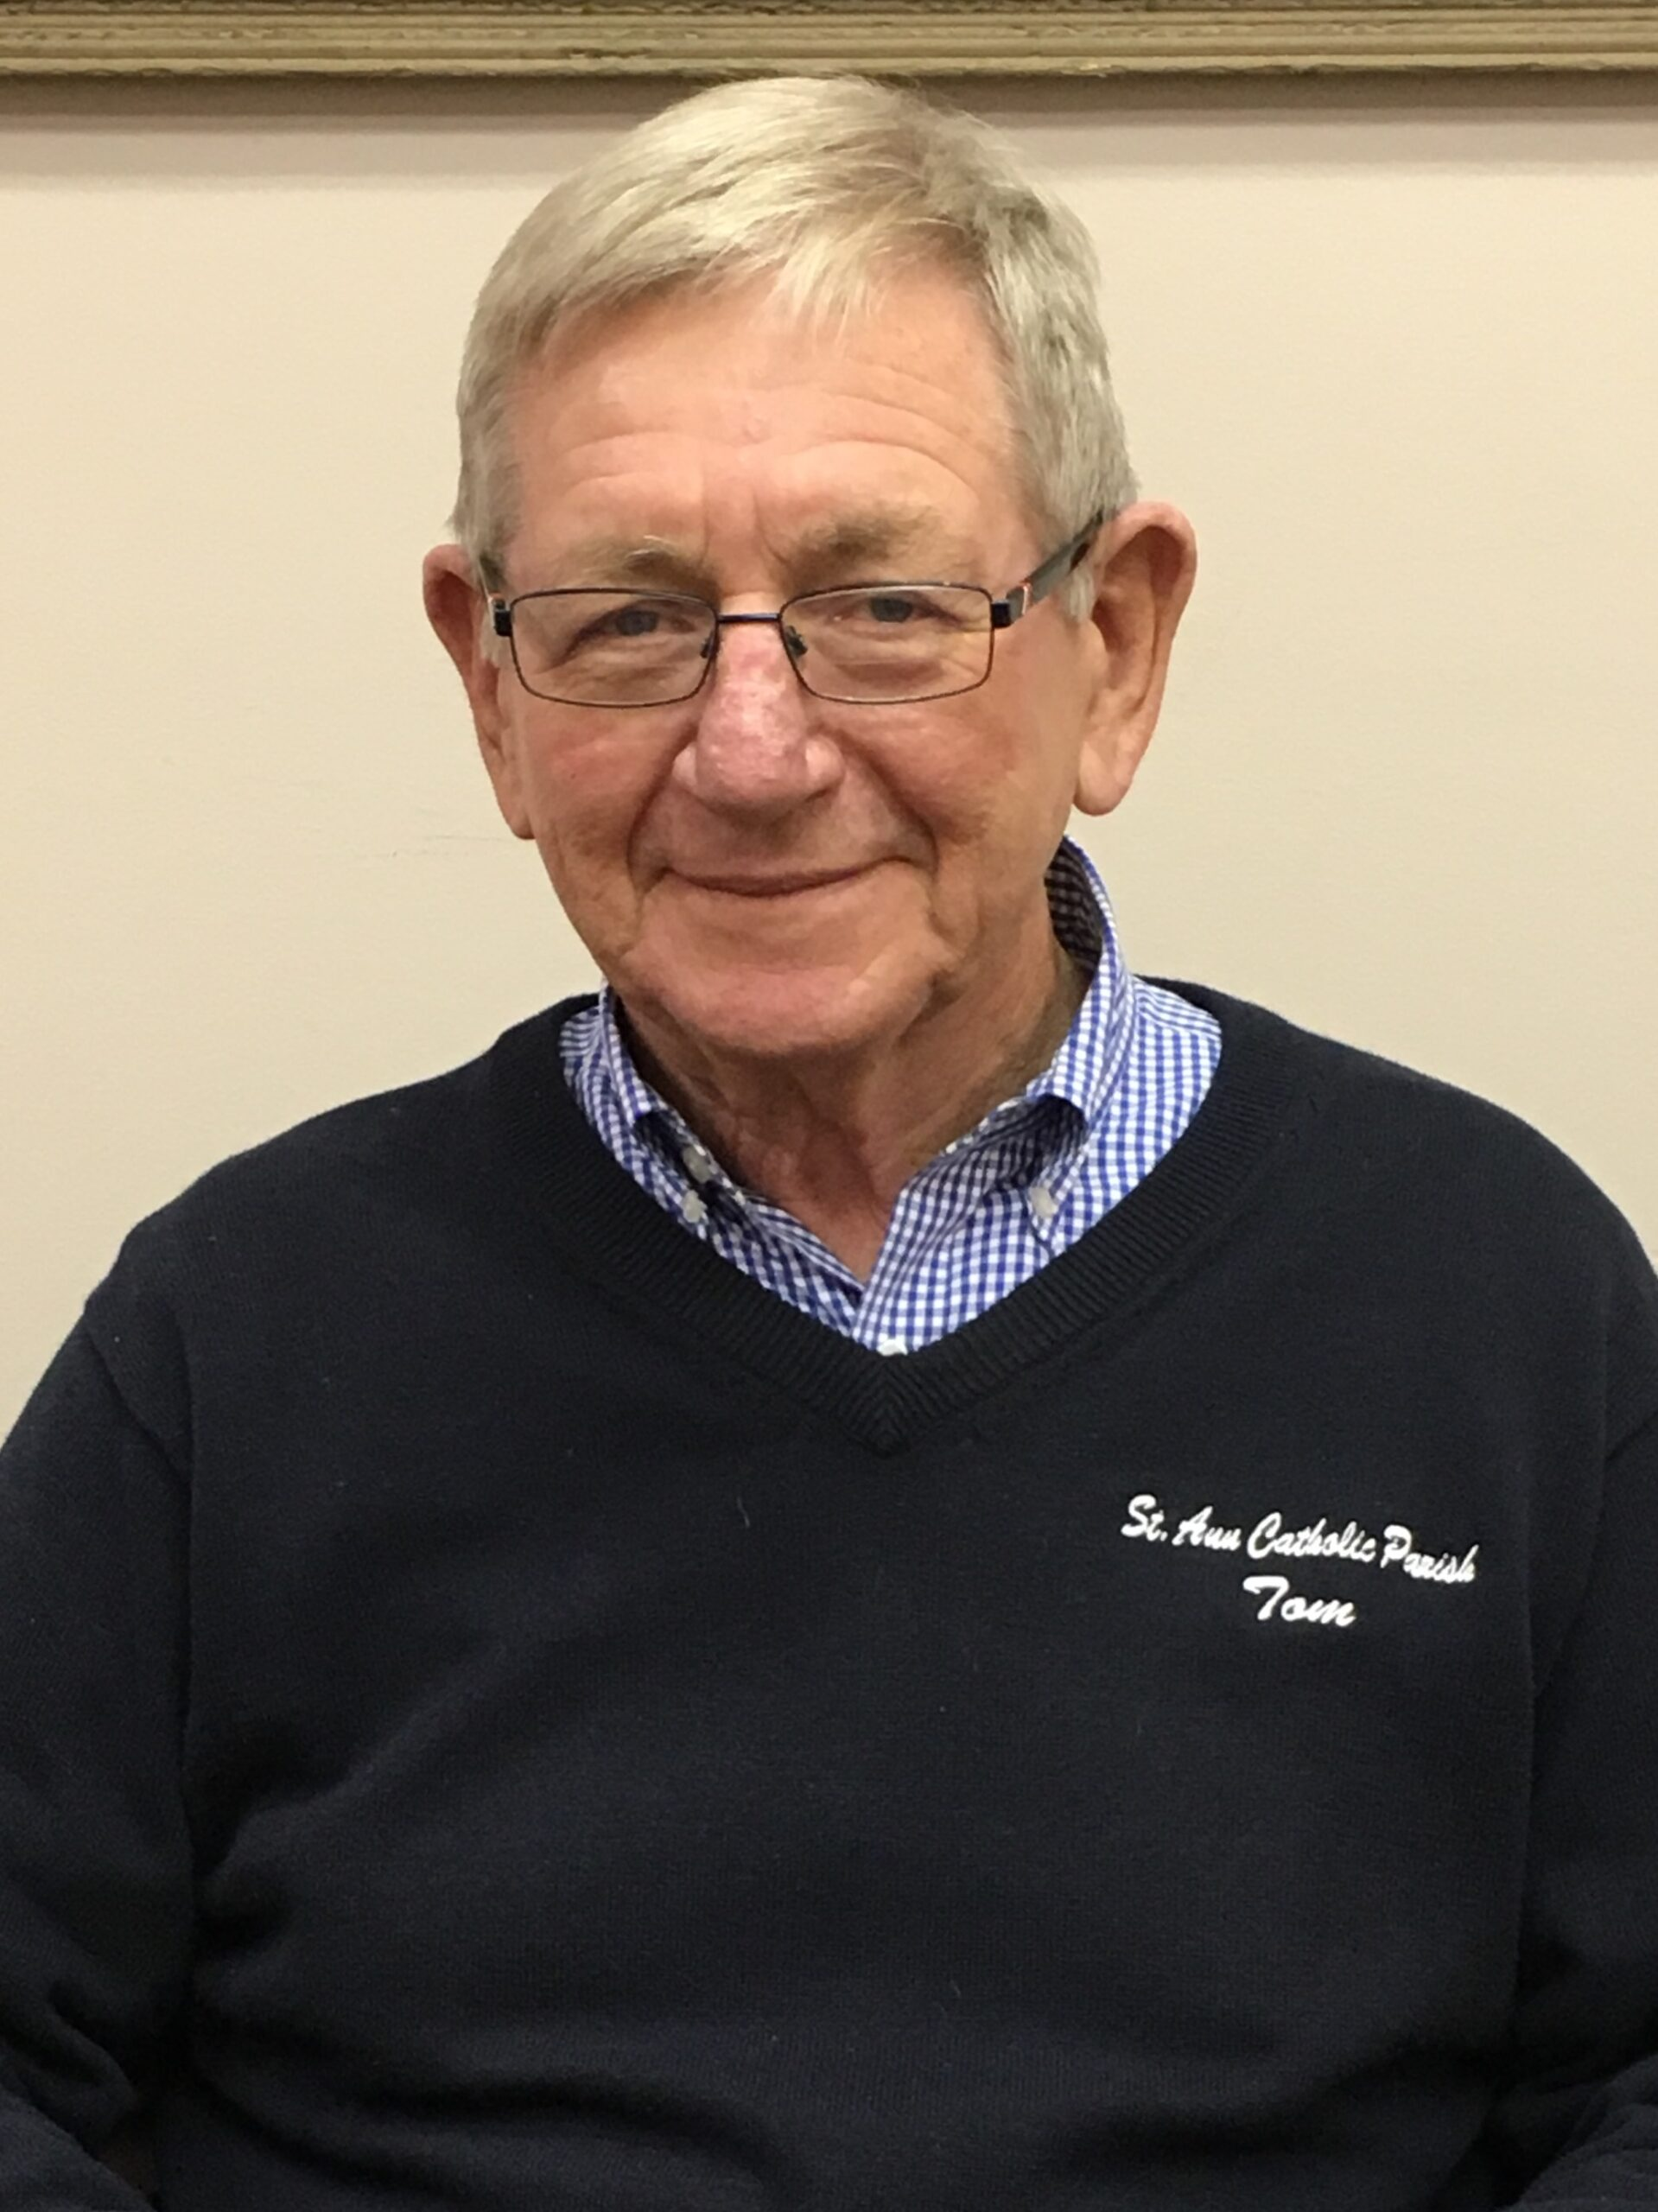 Tom Naile, Gulf Breeze Mayor pro tem